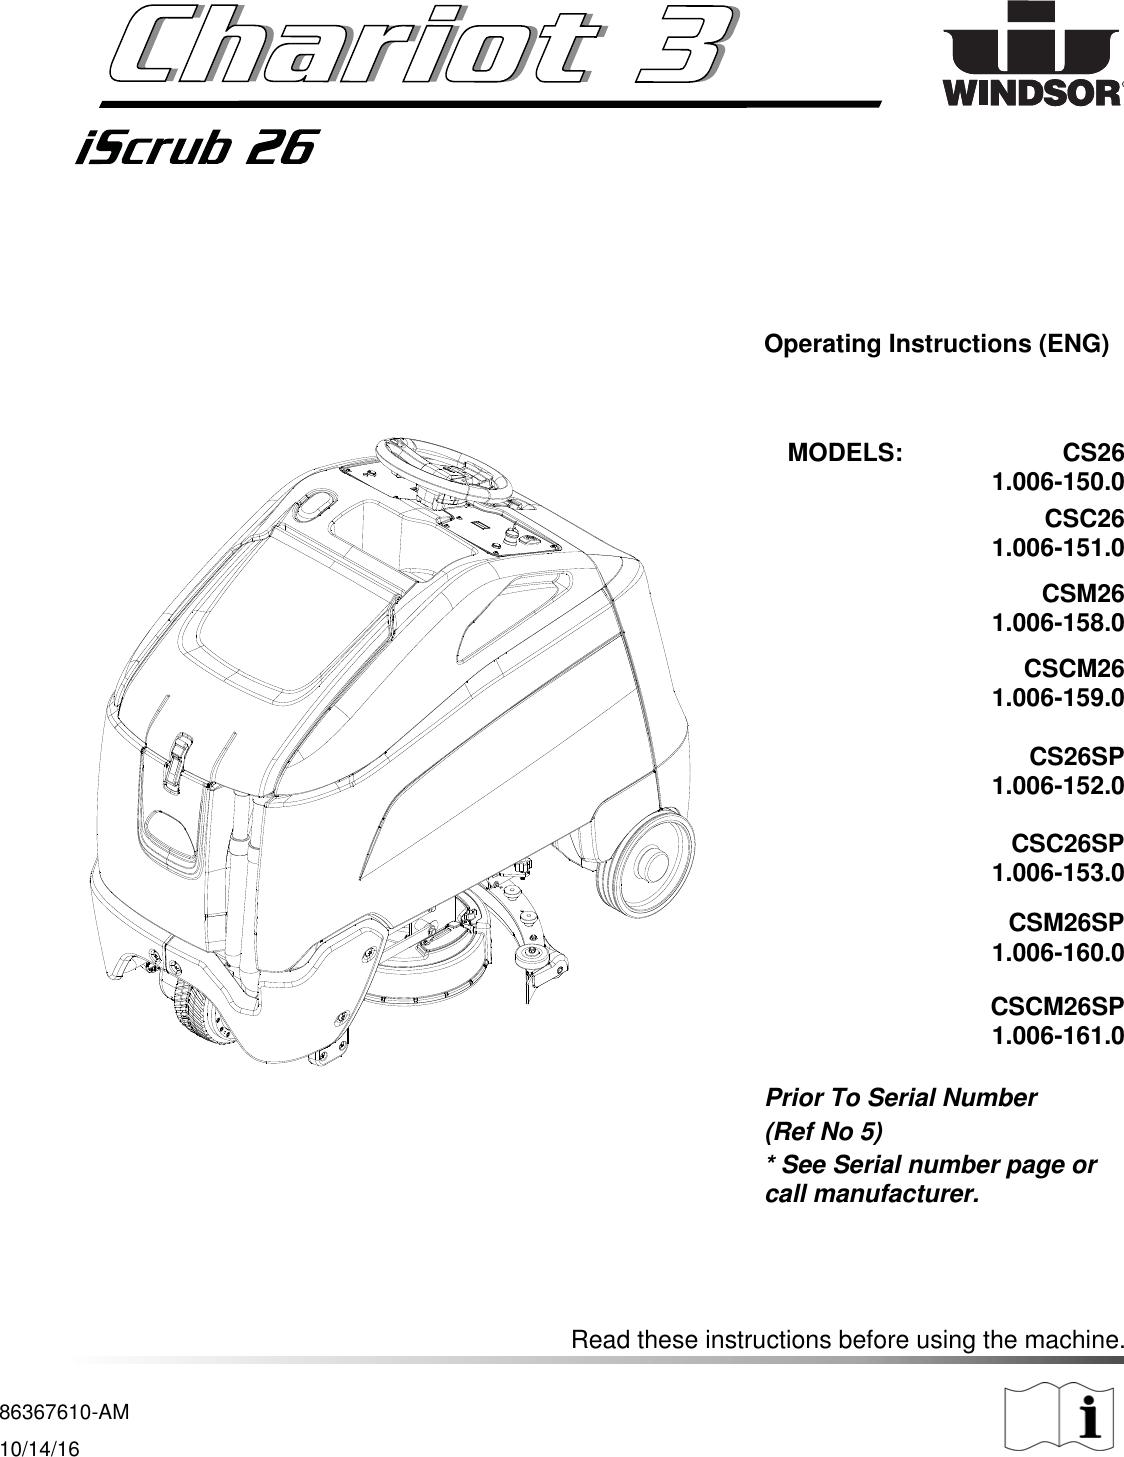 8 636 761 0 Chariot CS26 Windsor 3 iscrub 26 rider